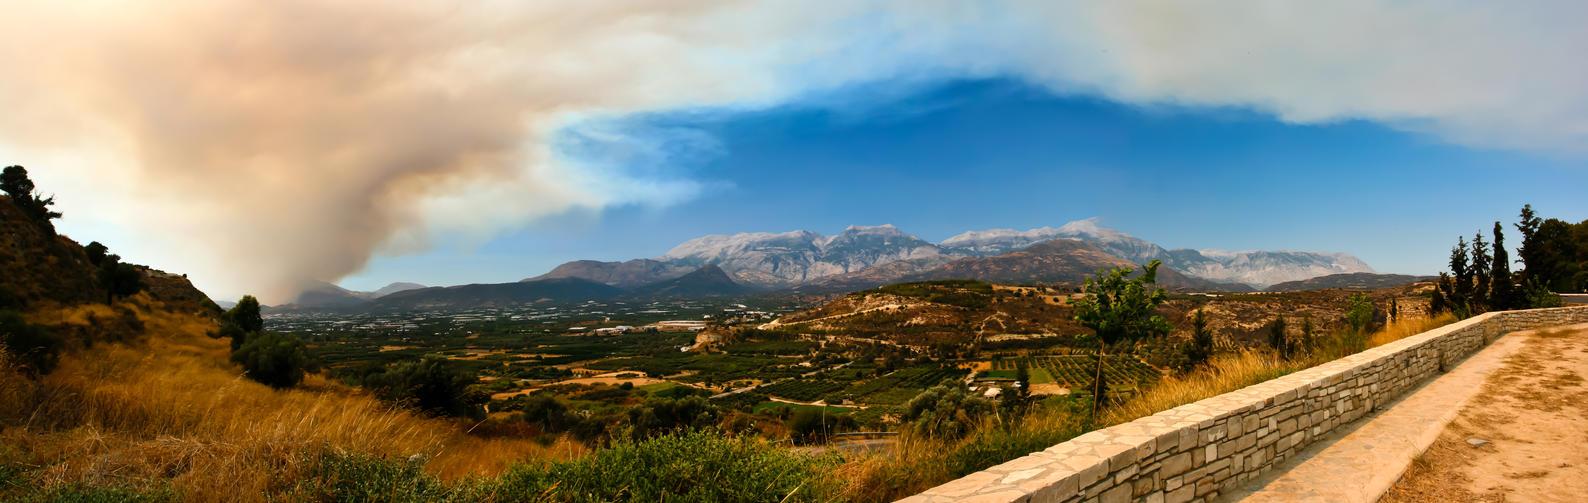 Creta Panoram by yuryudjin